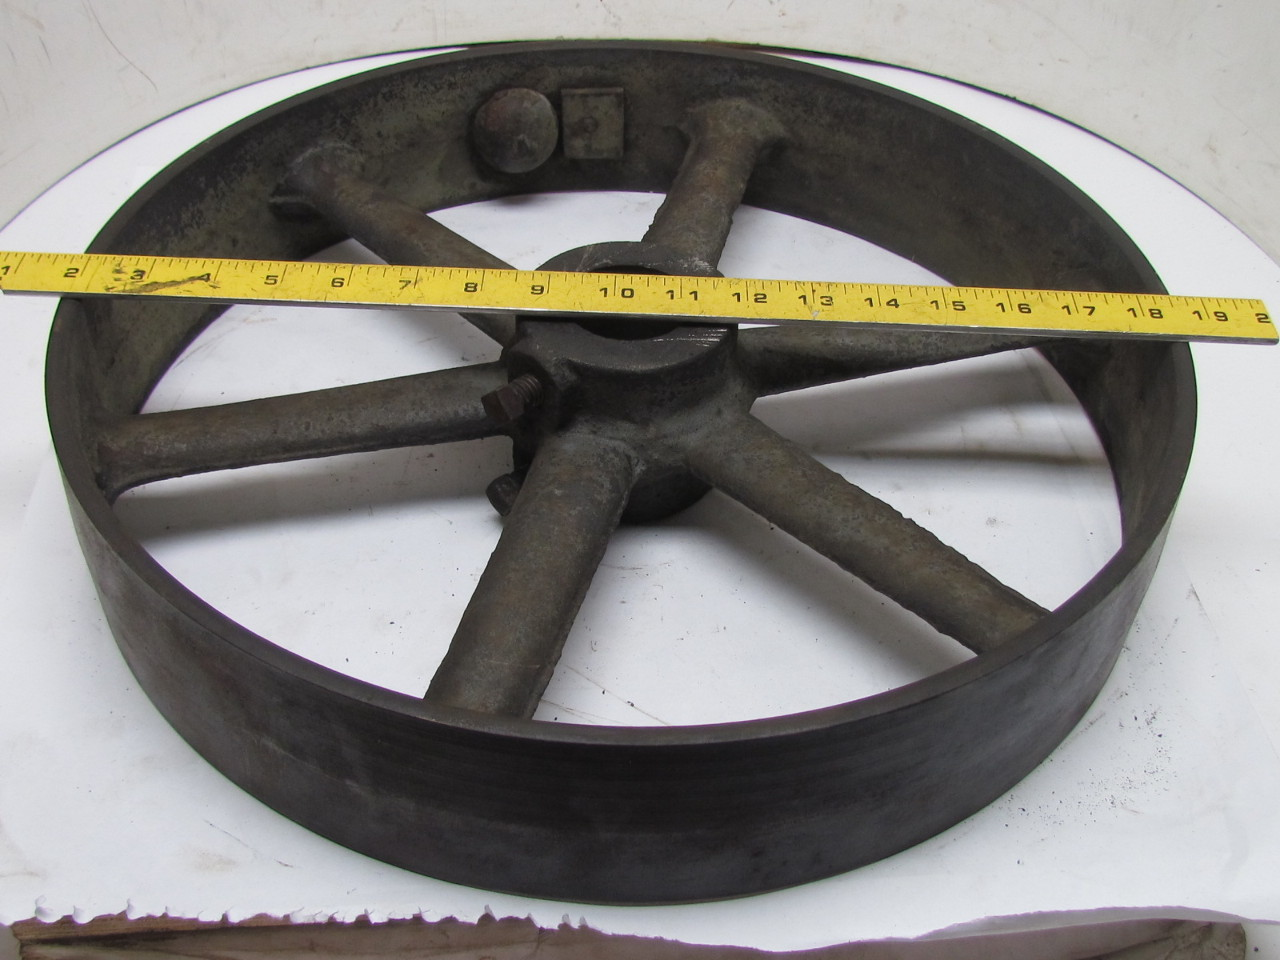 Antique Cast Iron Flywheels : Vintage industrial steampunk cast iron spoked flywheel